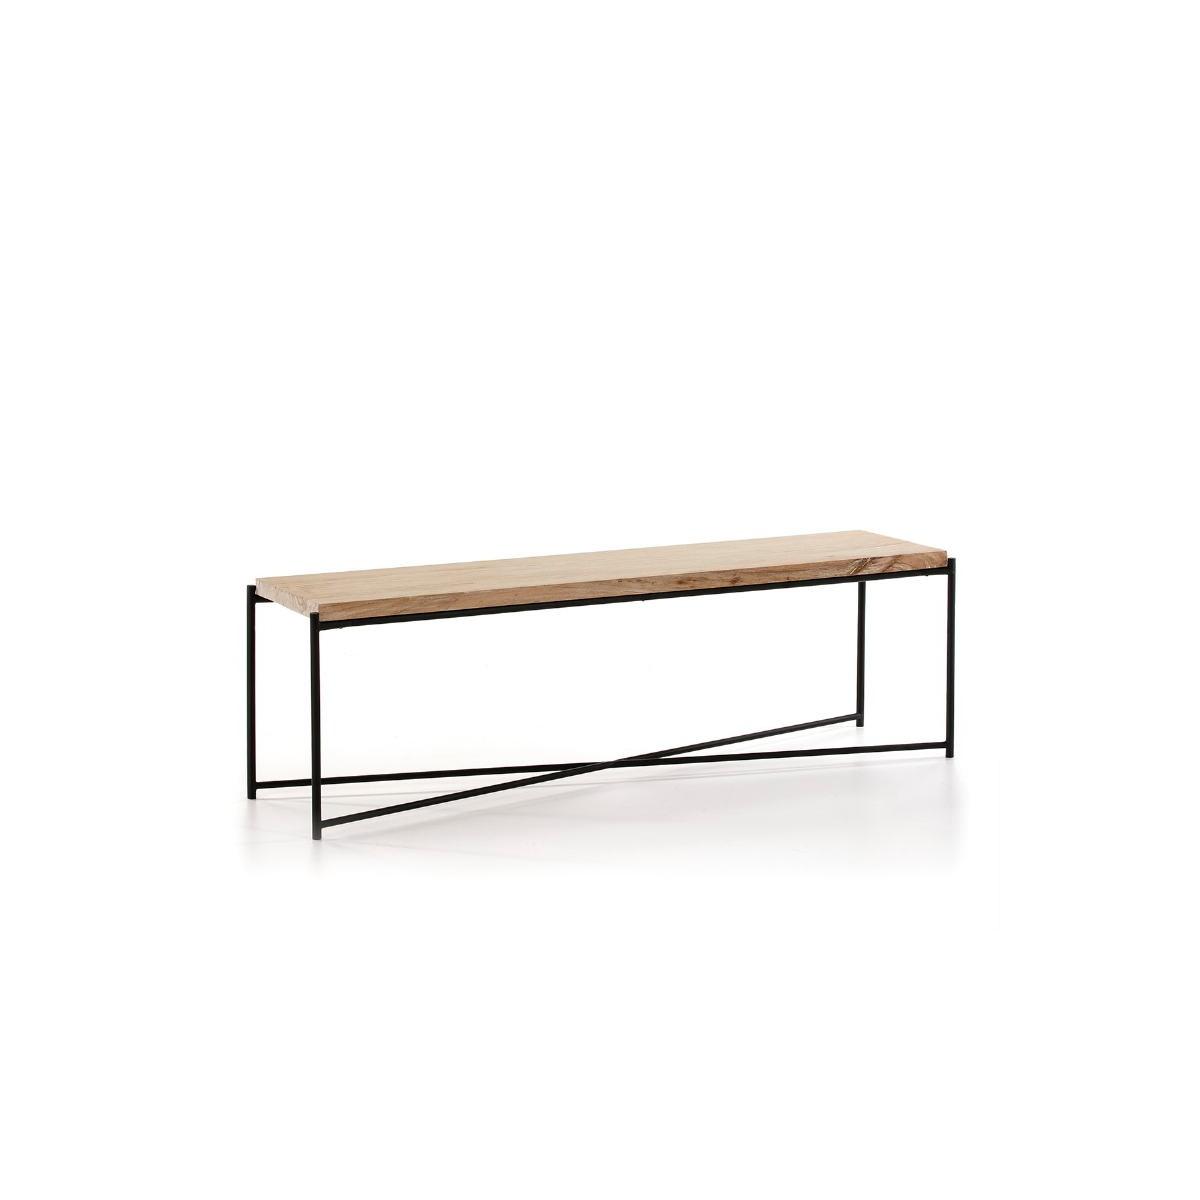 meuble tv 160x40x50 bois blanc blanchi metal noir amp story 7498